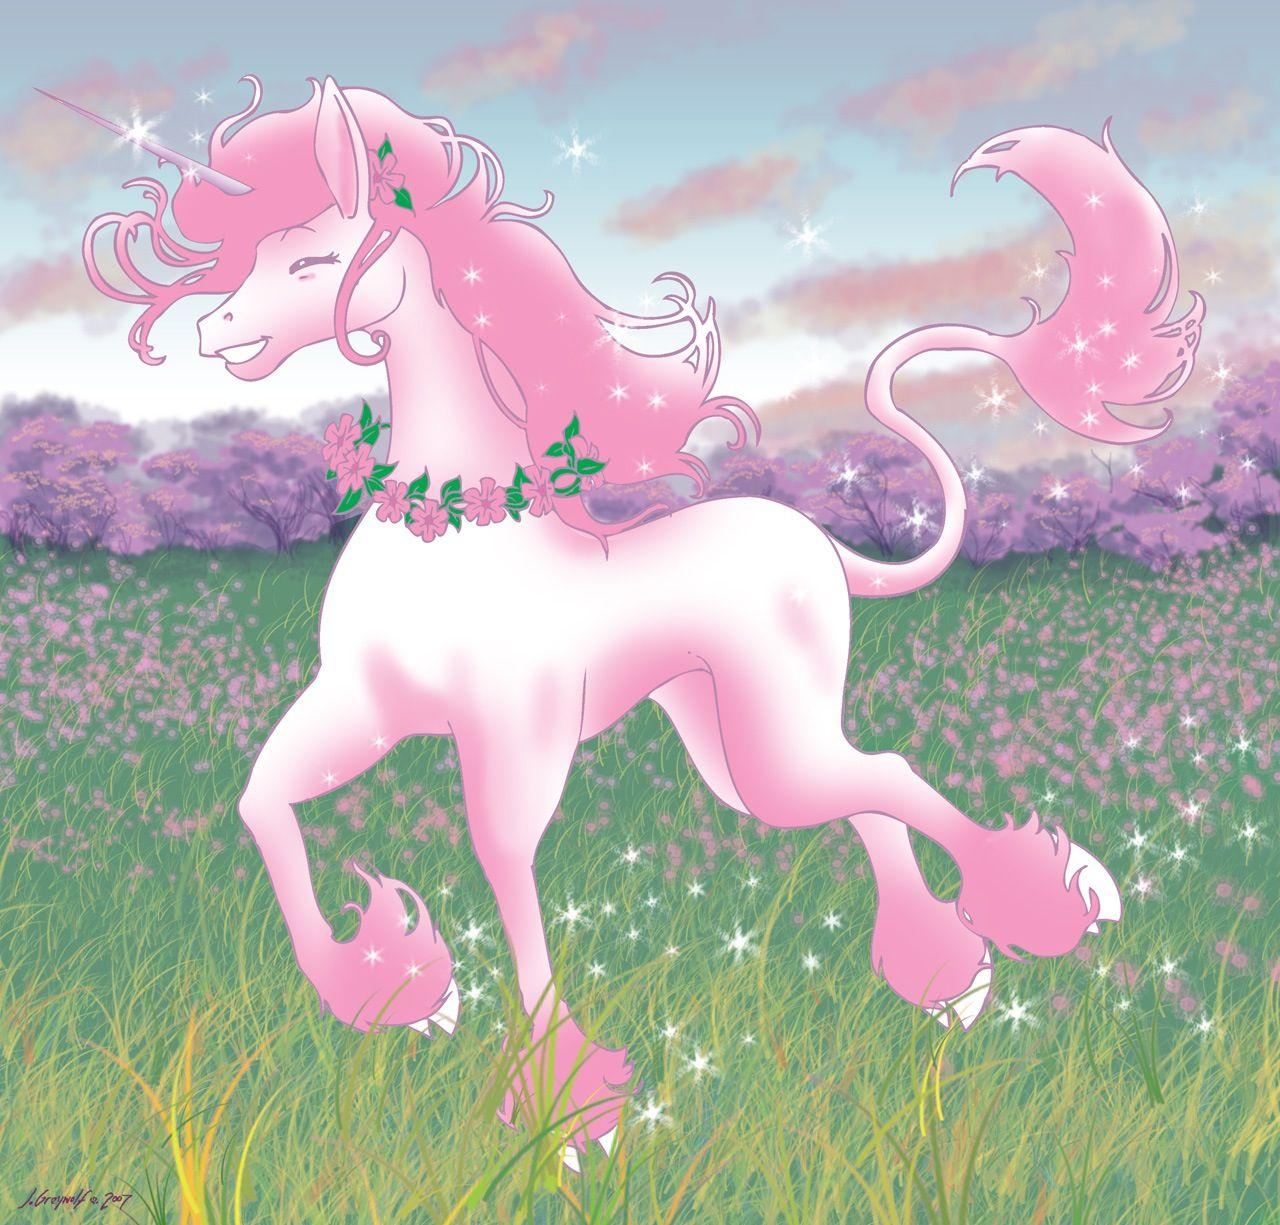 Pink Fluffy Unicorns Dancing On Rainbows Unicorn Pictures Unicorn Photos Unicorn